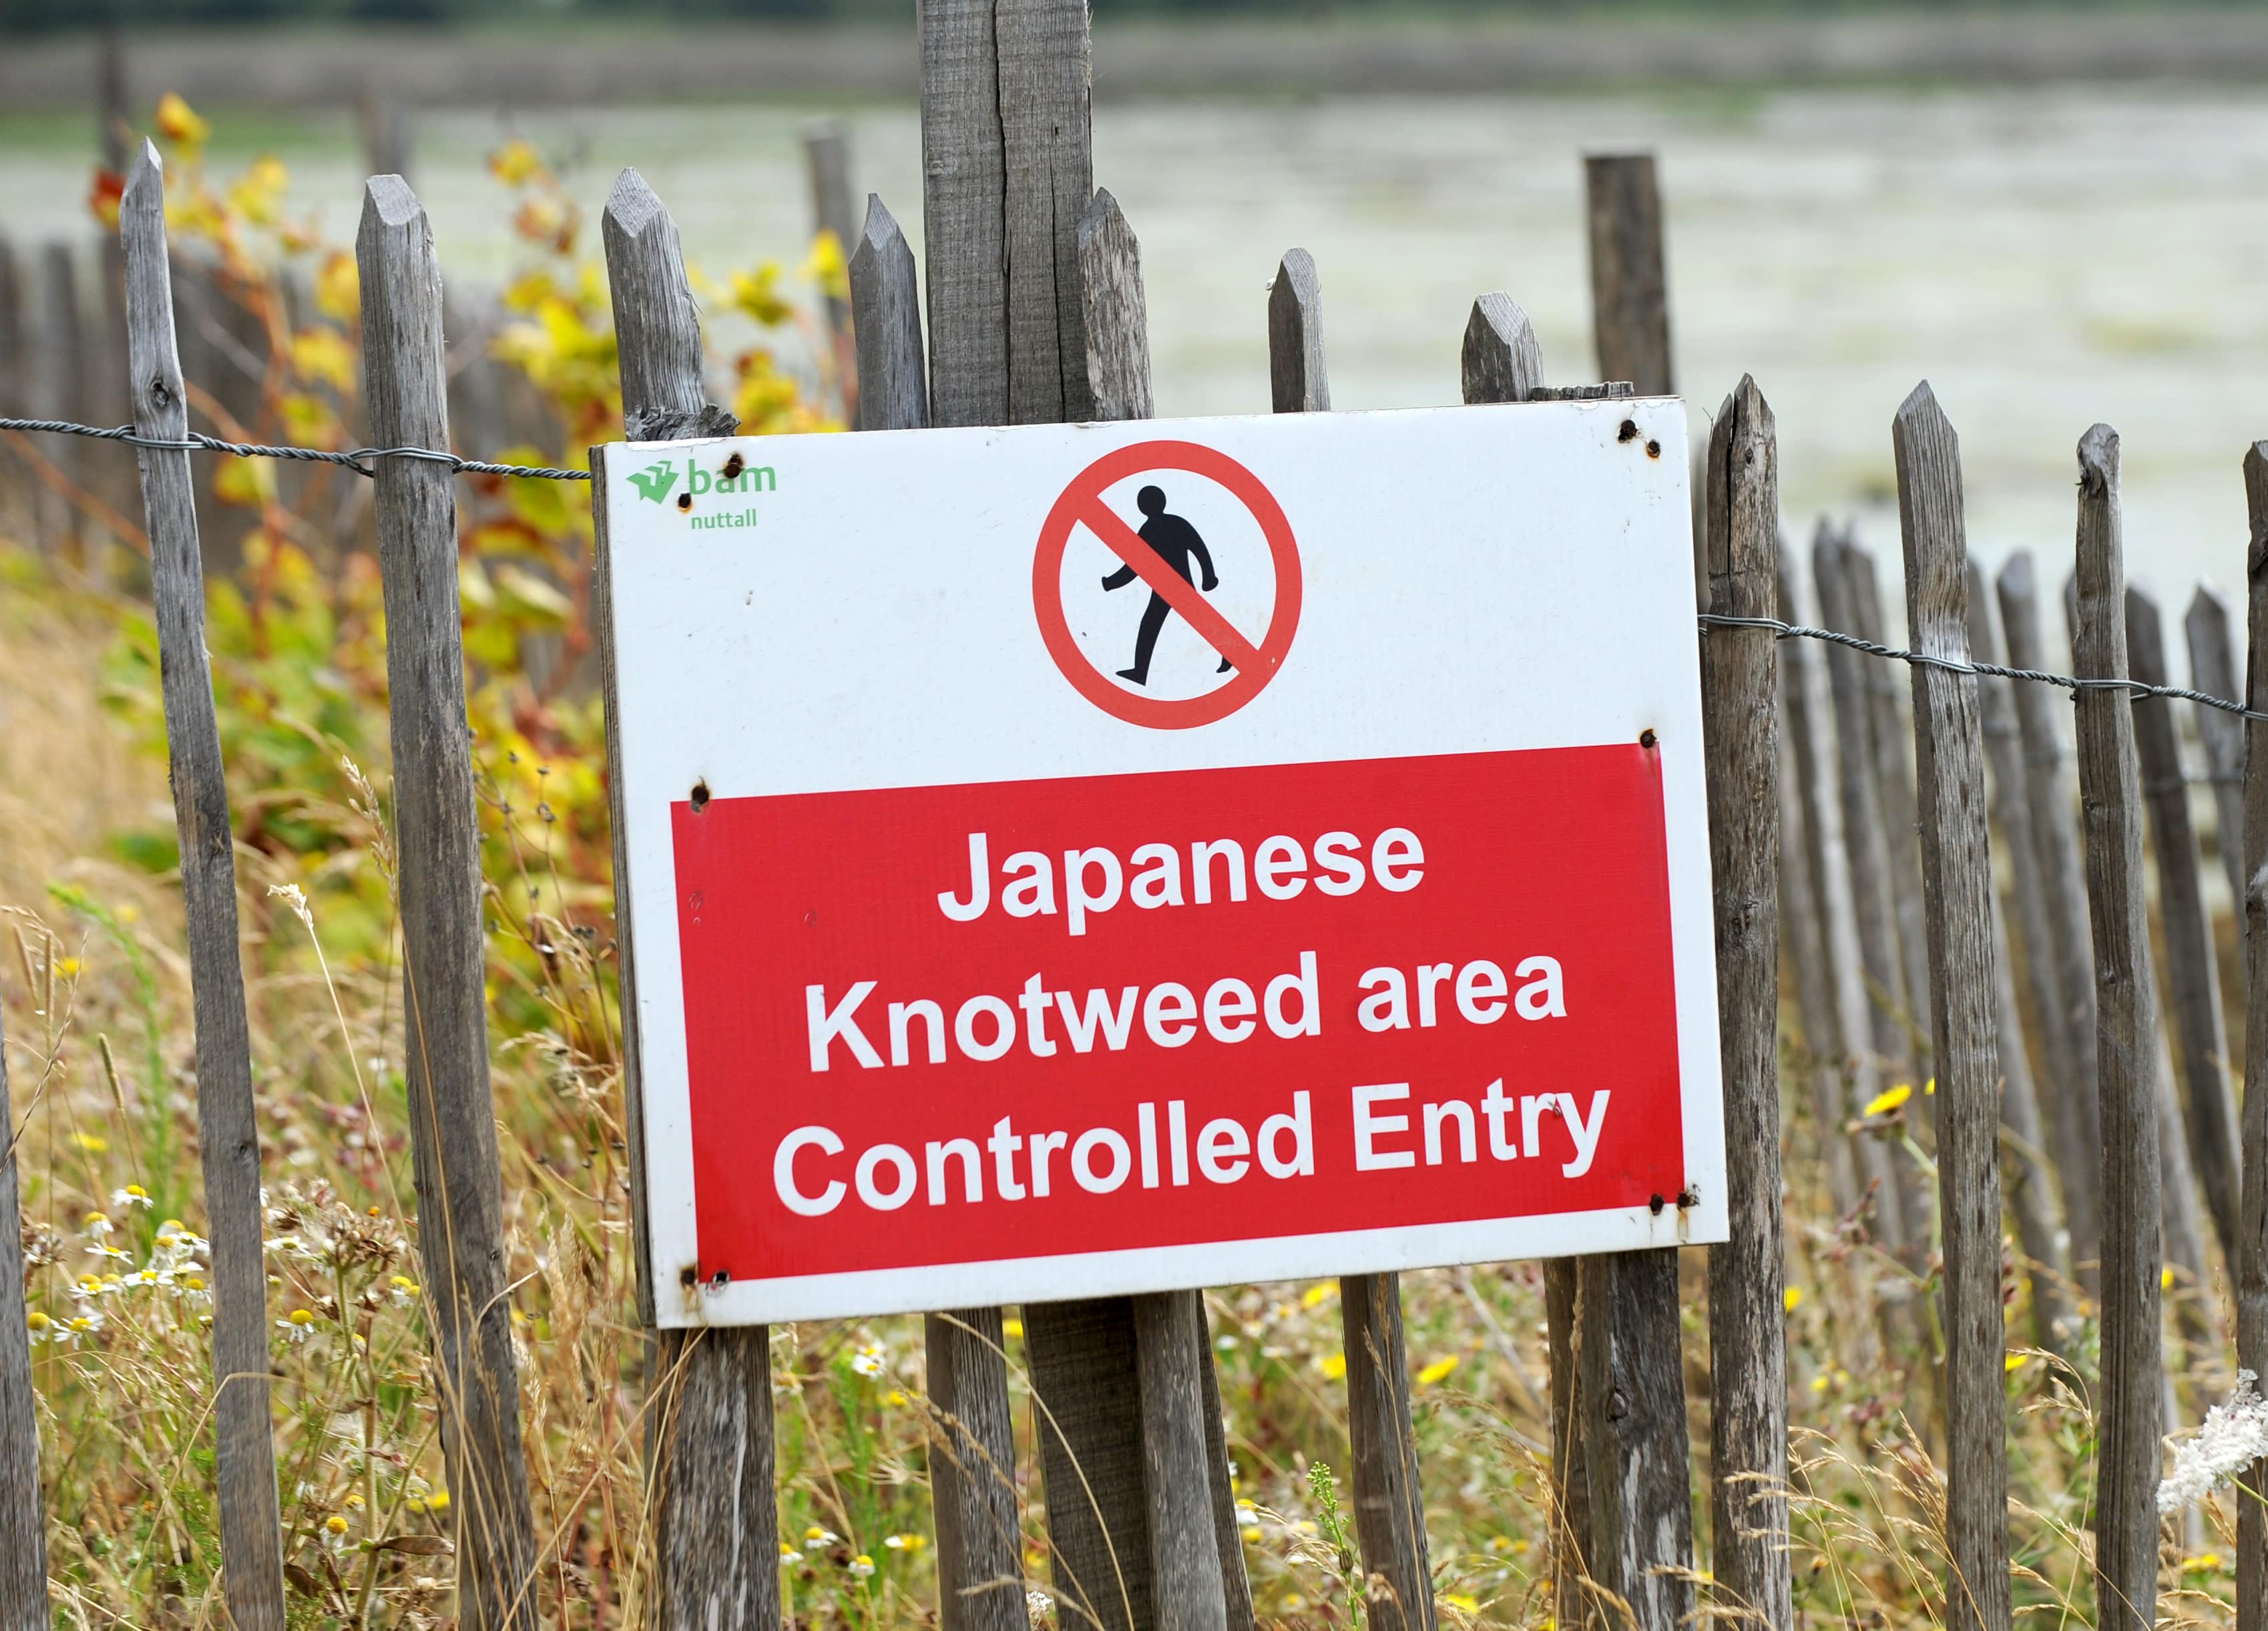 Japanese knotweed is knocking £34bn off of UK property values